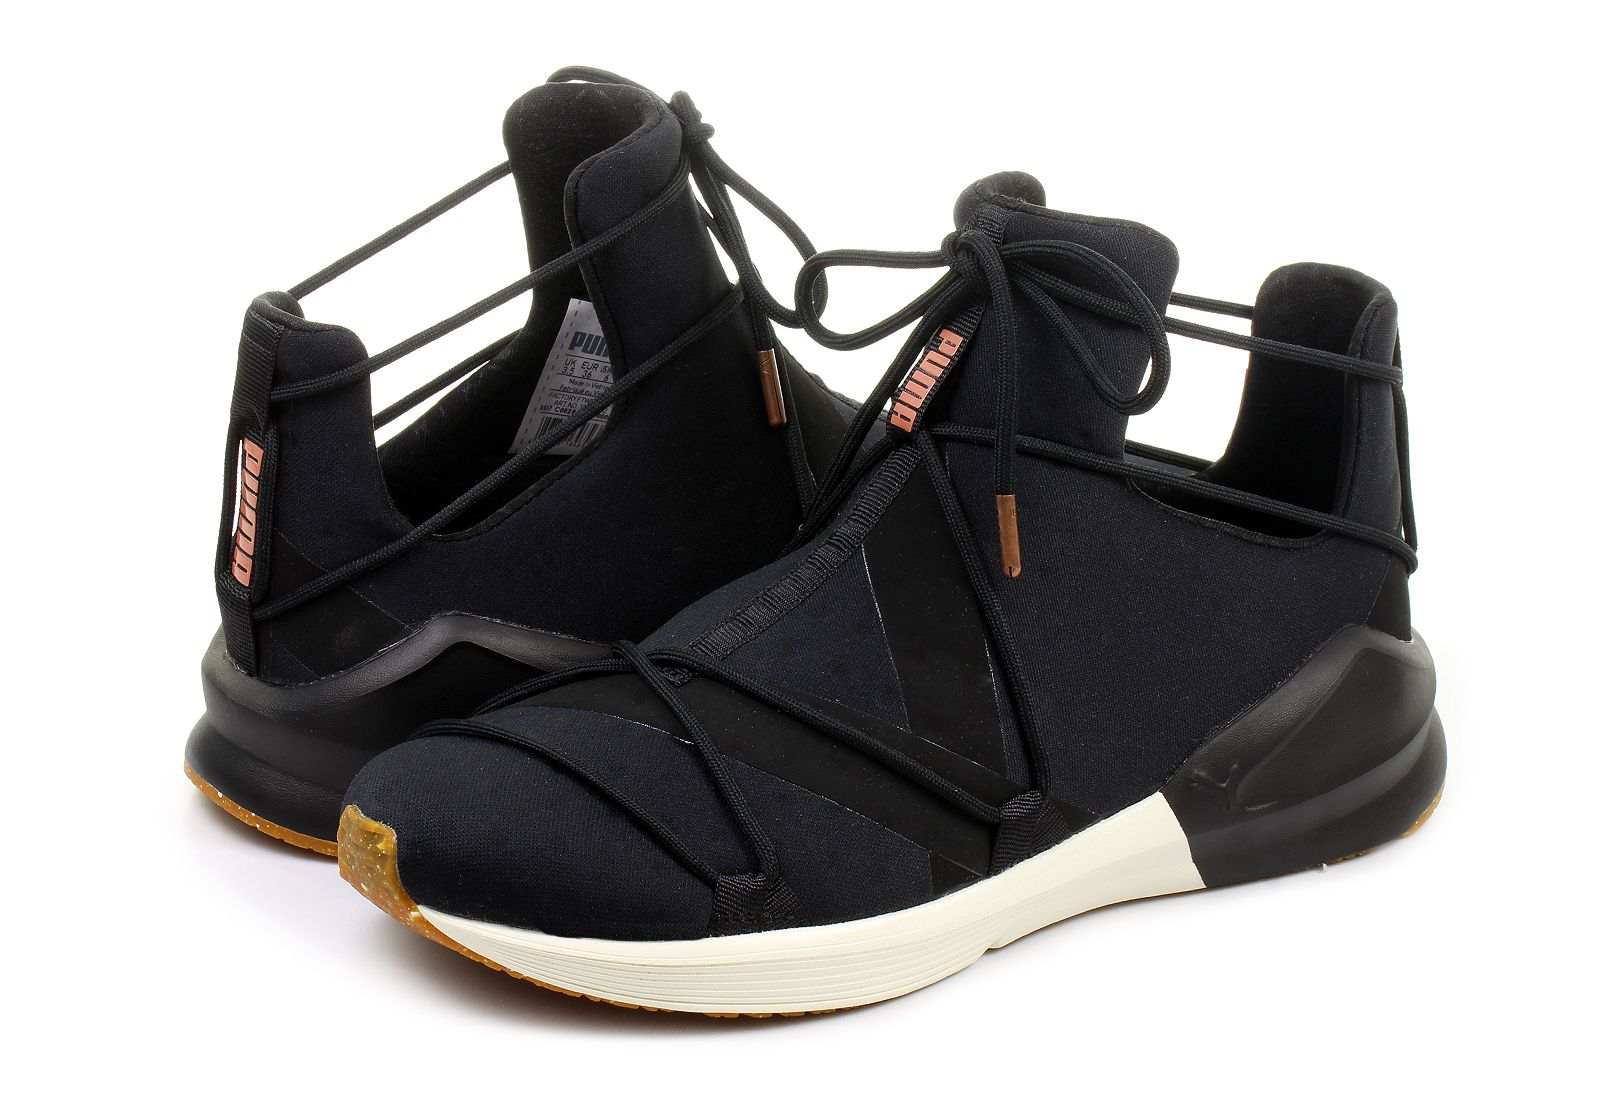 ee10ff0185d2d1 Puma Shoes - Fierce Rope Vr Wn s - 19013602-blk - Online shop for ...